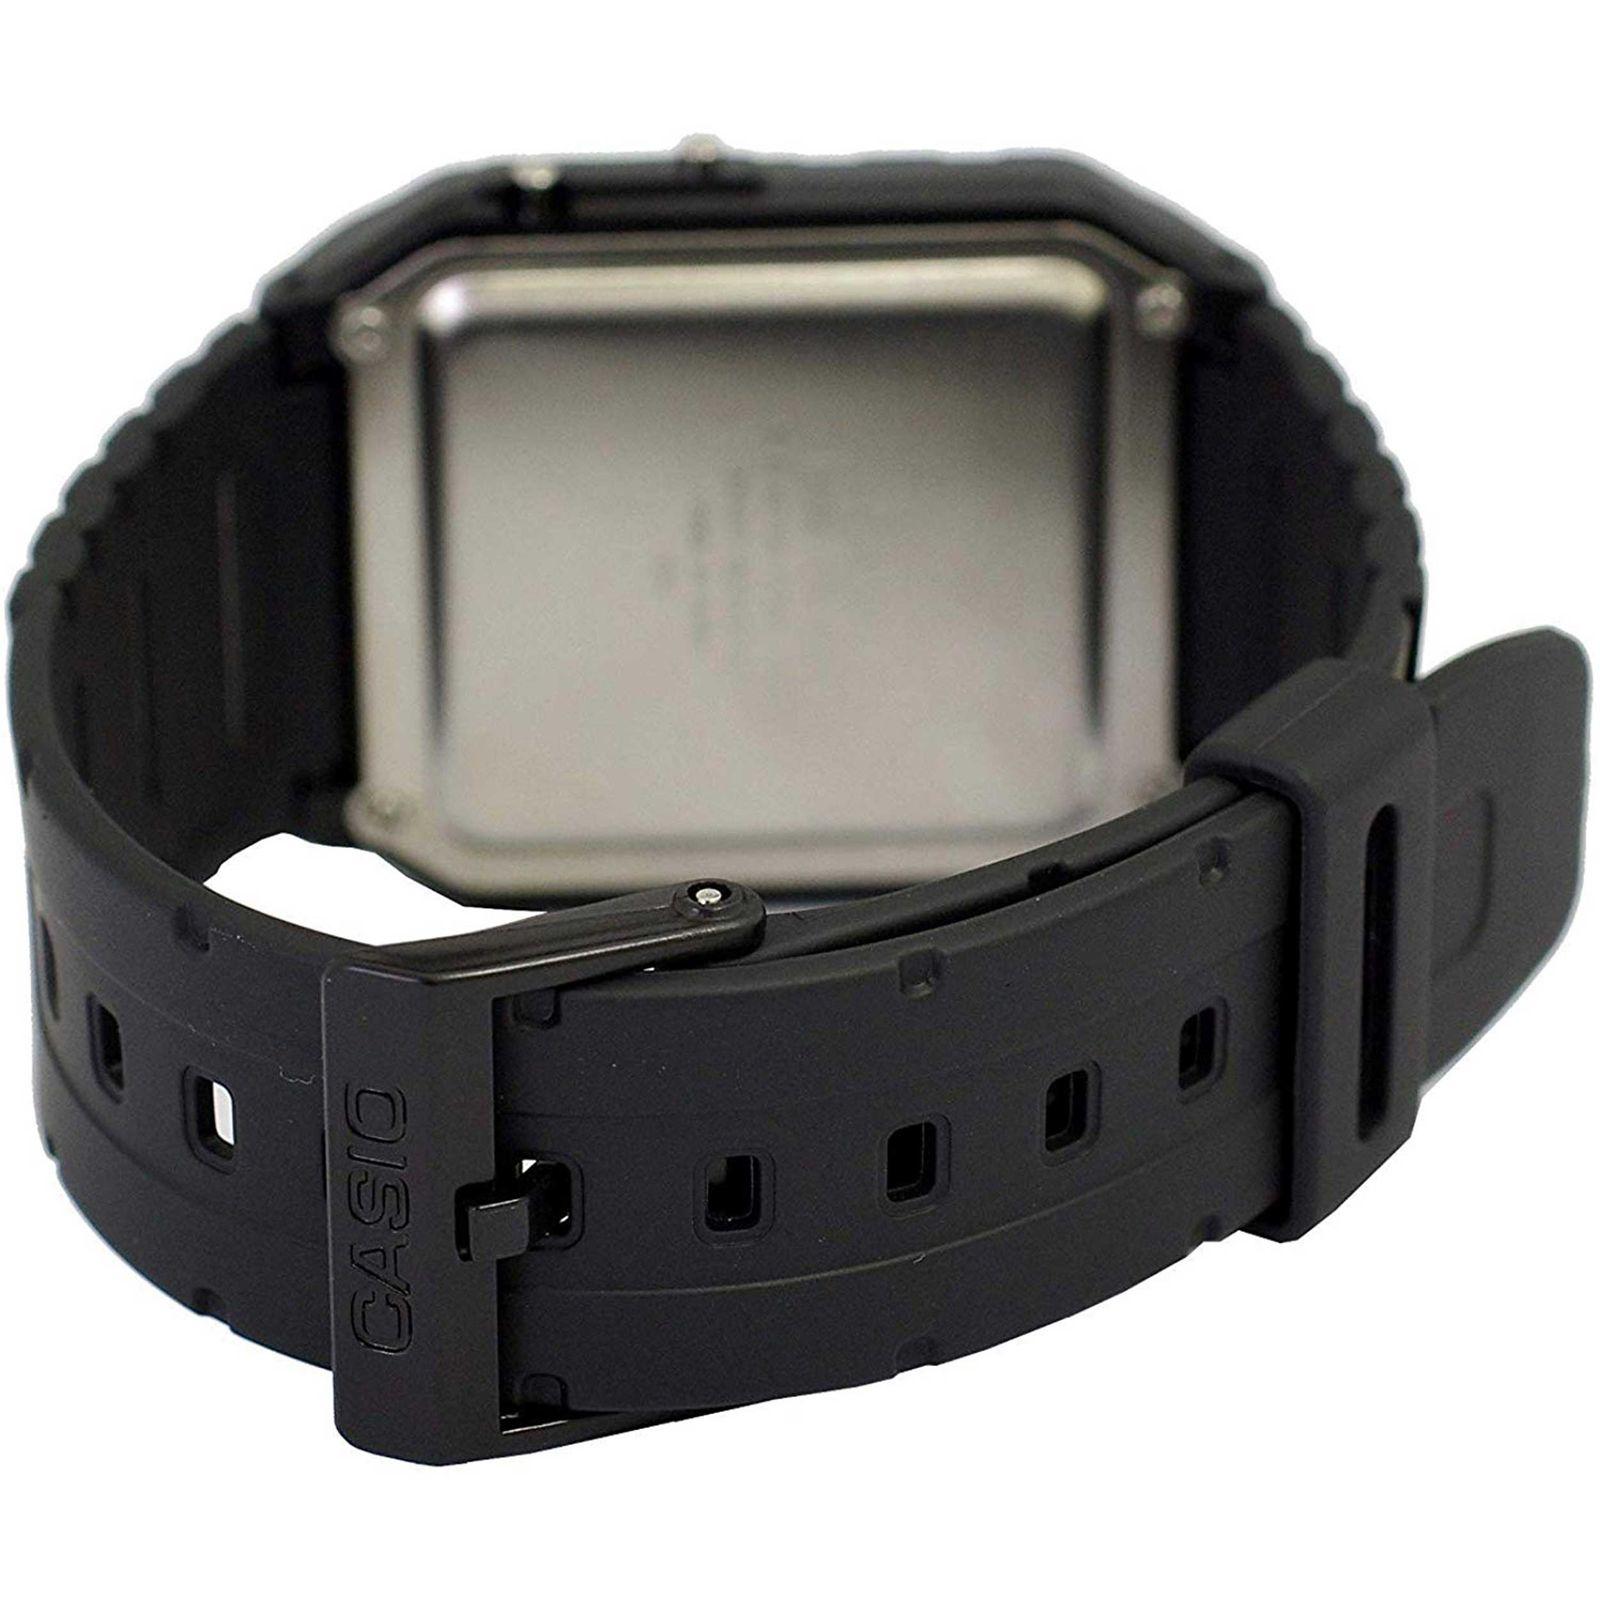 ساعت مچی دیجیتال کاسیو مدل 4971850223405 - مشکی - 2